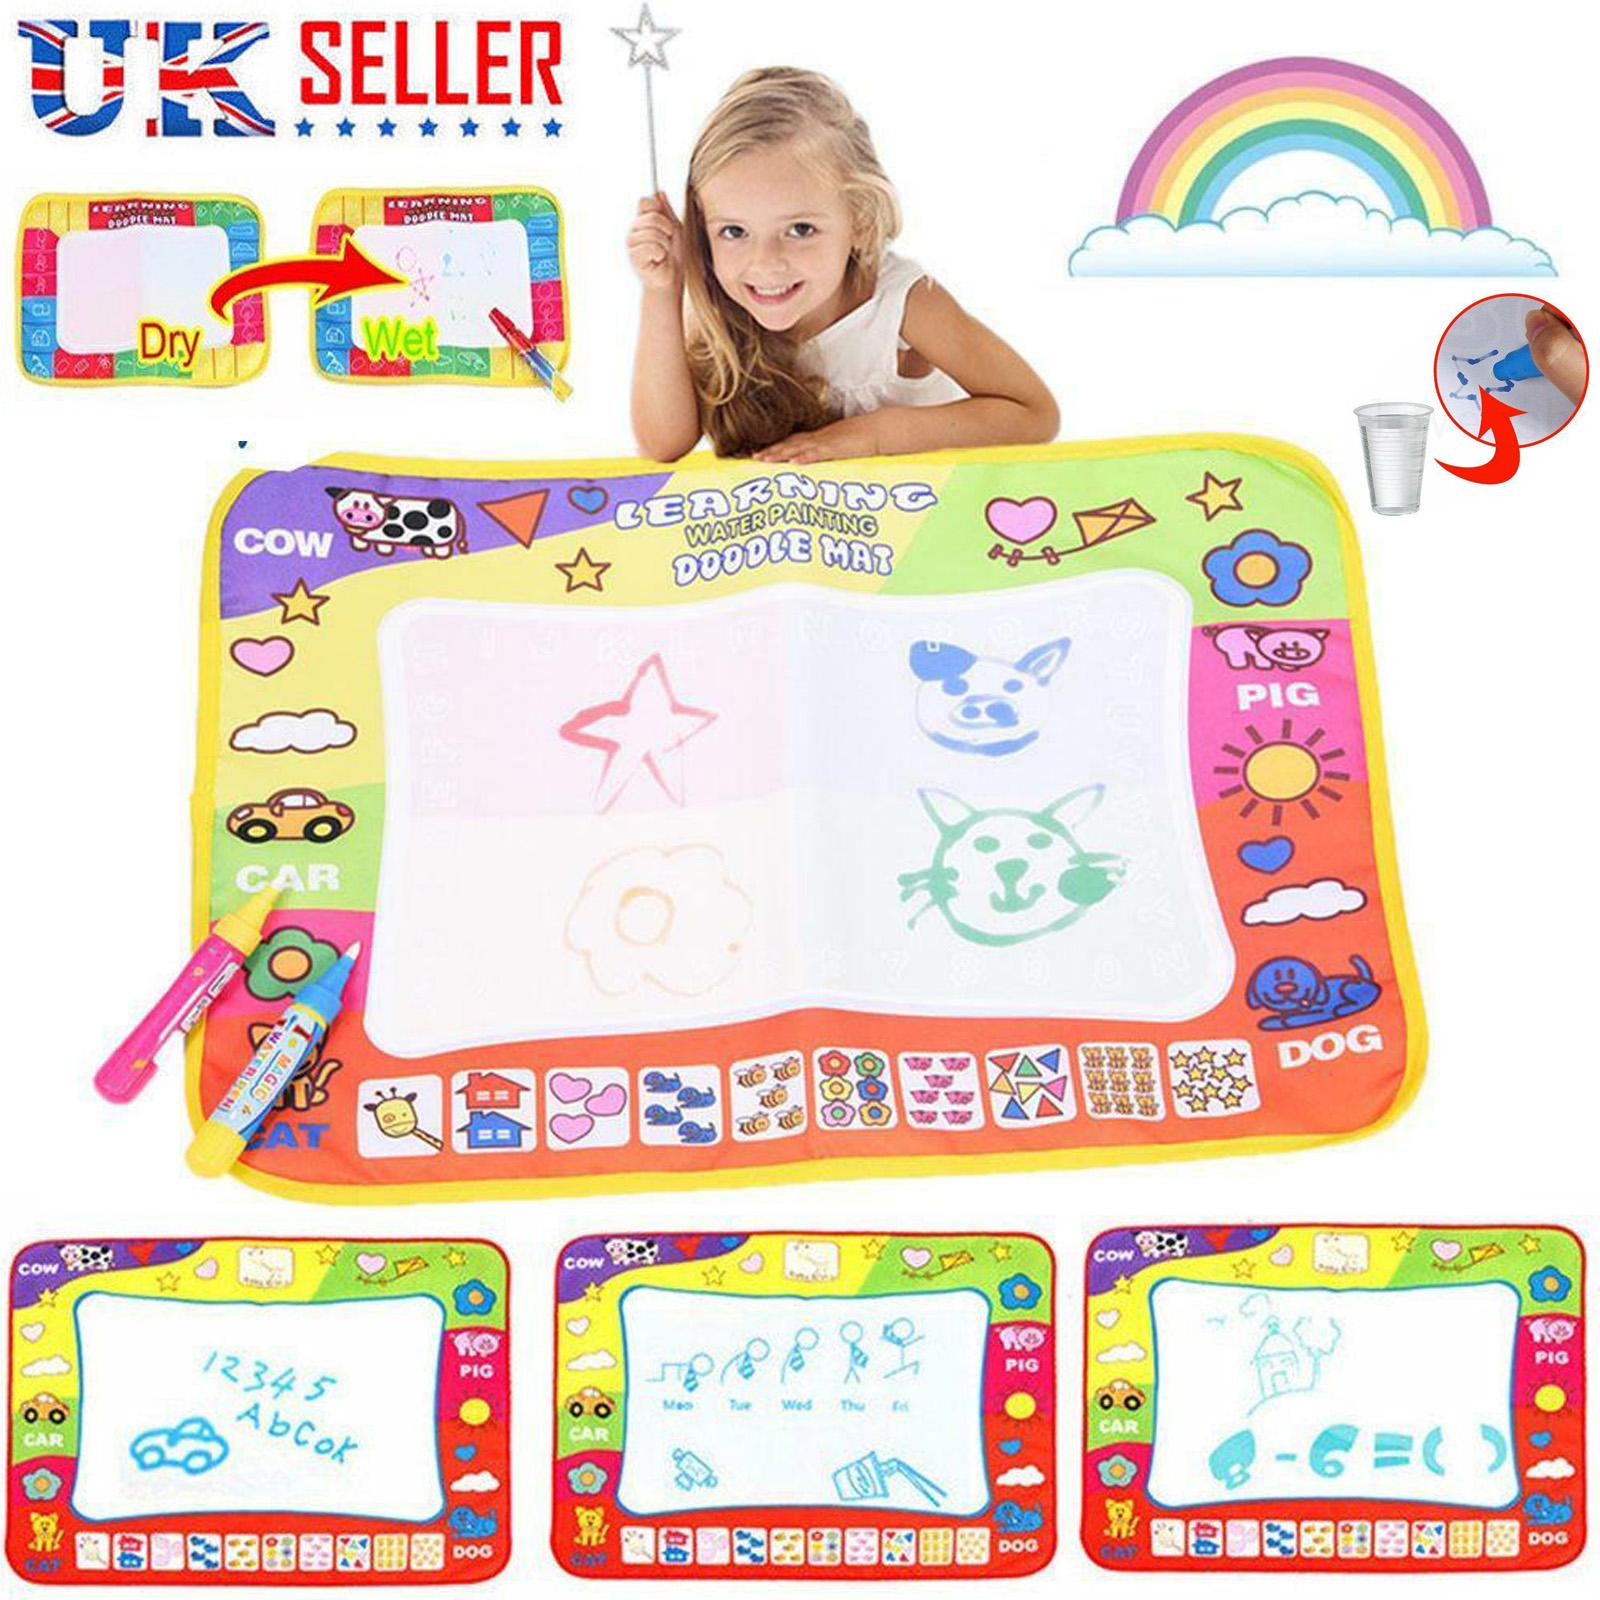 Kids Water Scrawl Mat Drawing Painting Magic Pen Baby Toddler Toys Games Gifts I